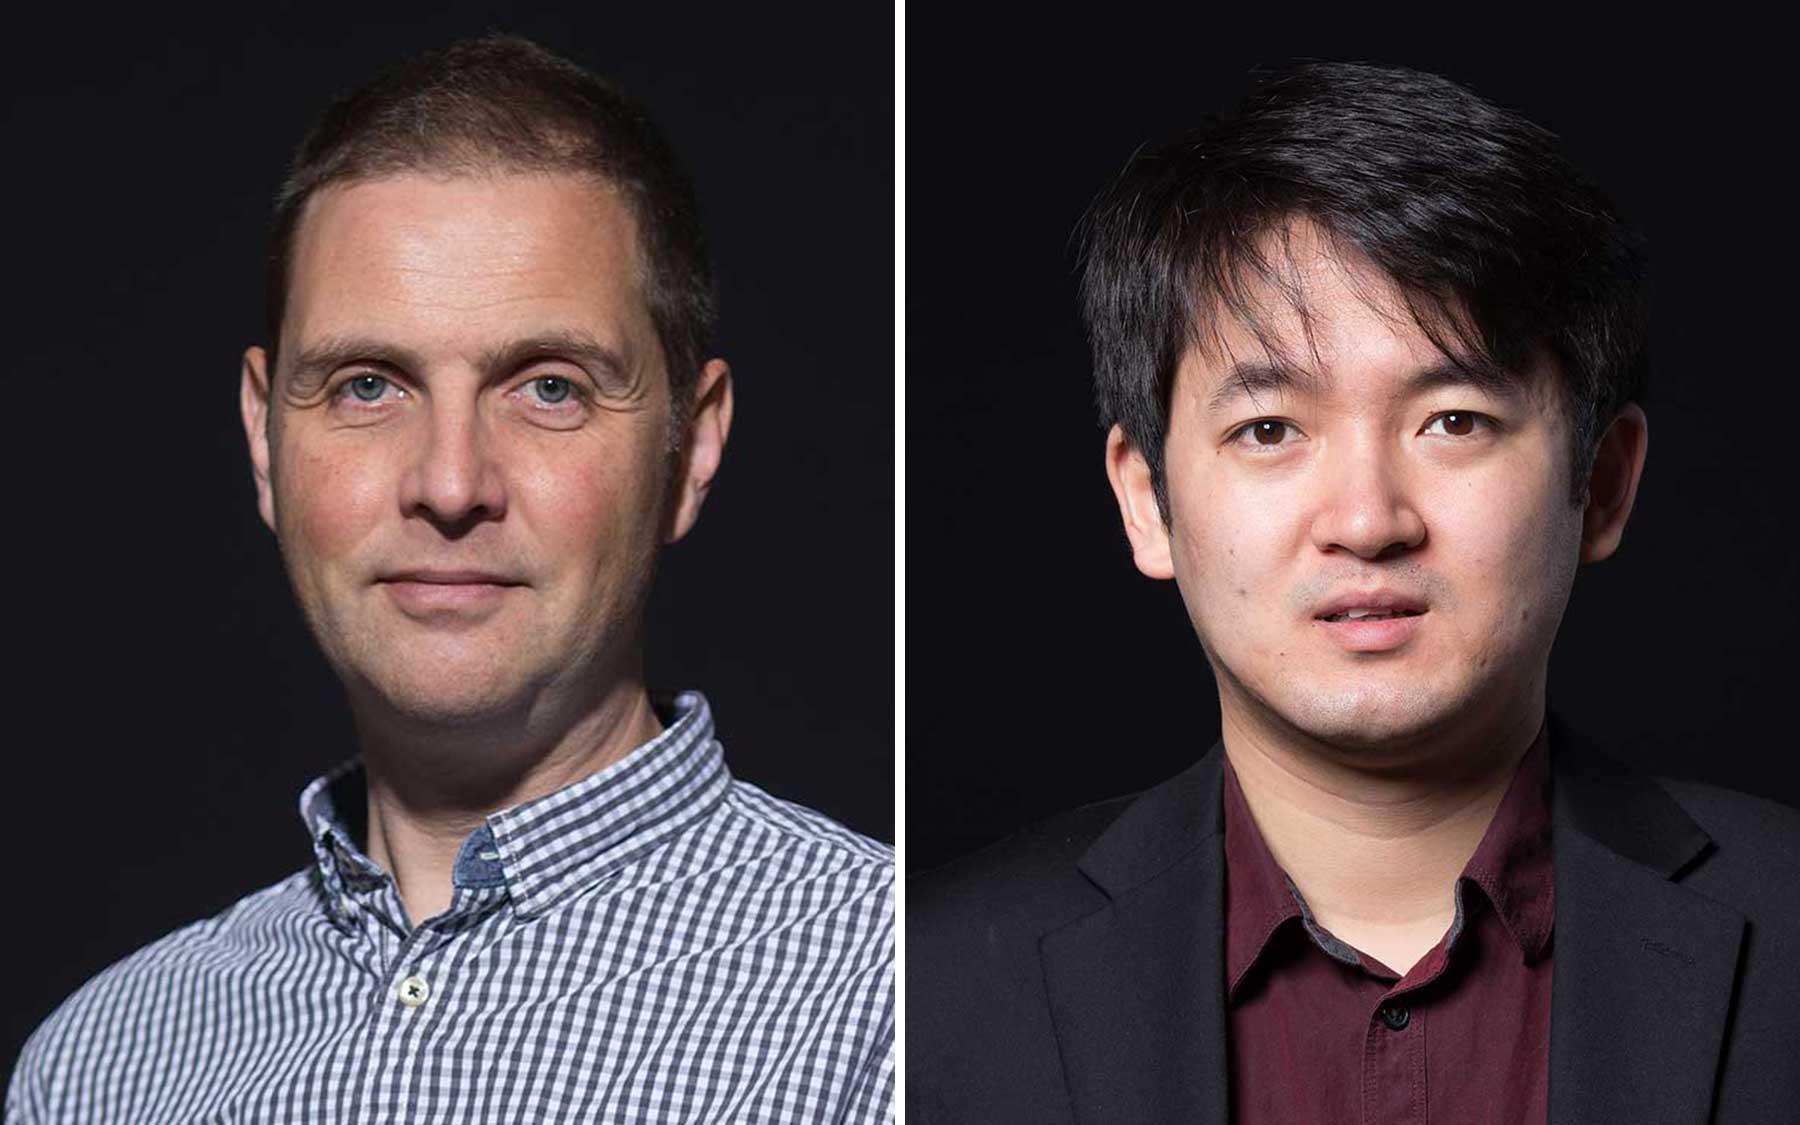 Scott Lyons and Lingbo Zhang